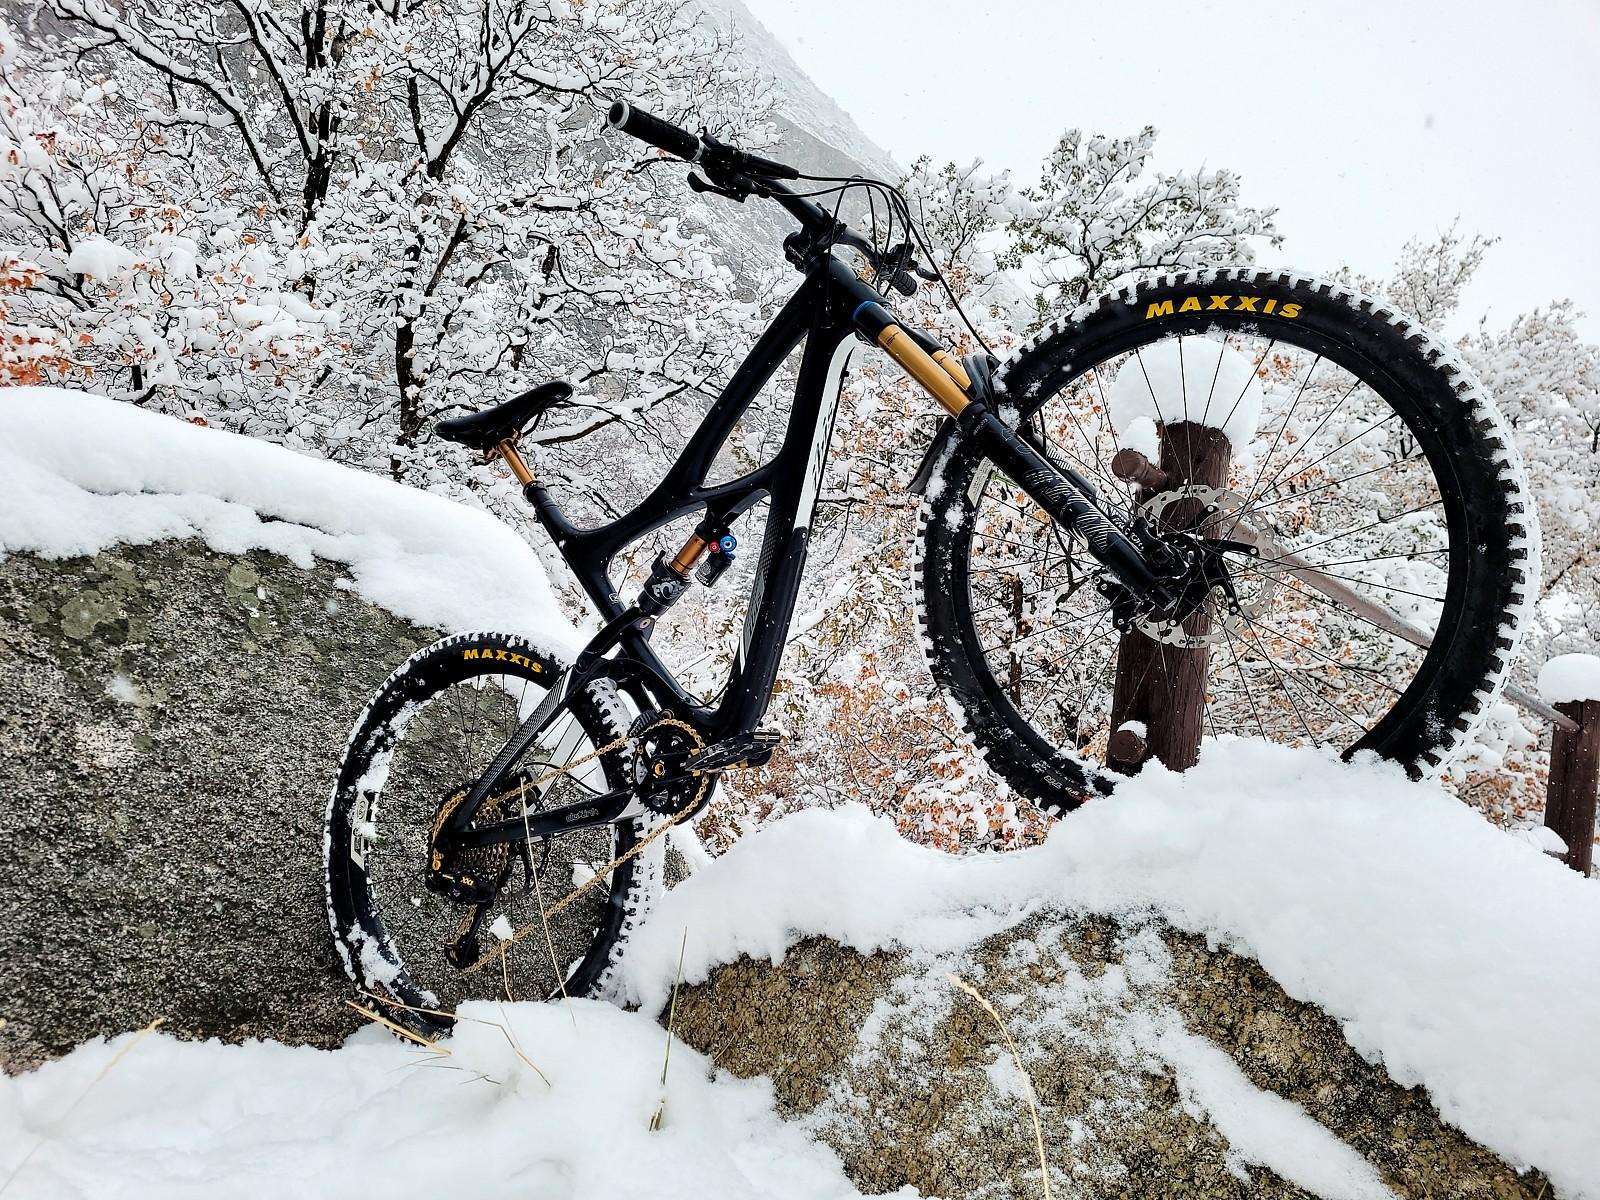 20201109 142154 01 - MojoMadness3 - Mountain Biking Pictures - Vital MTB